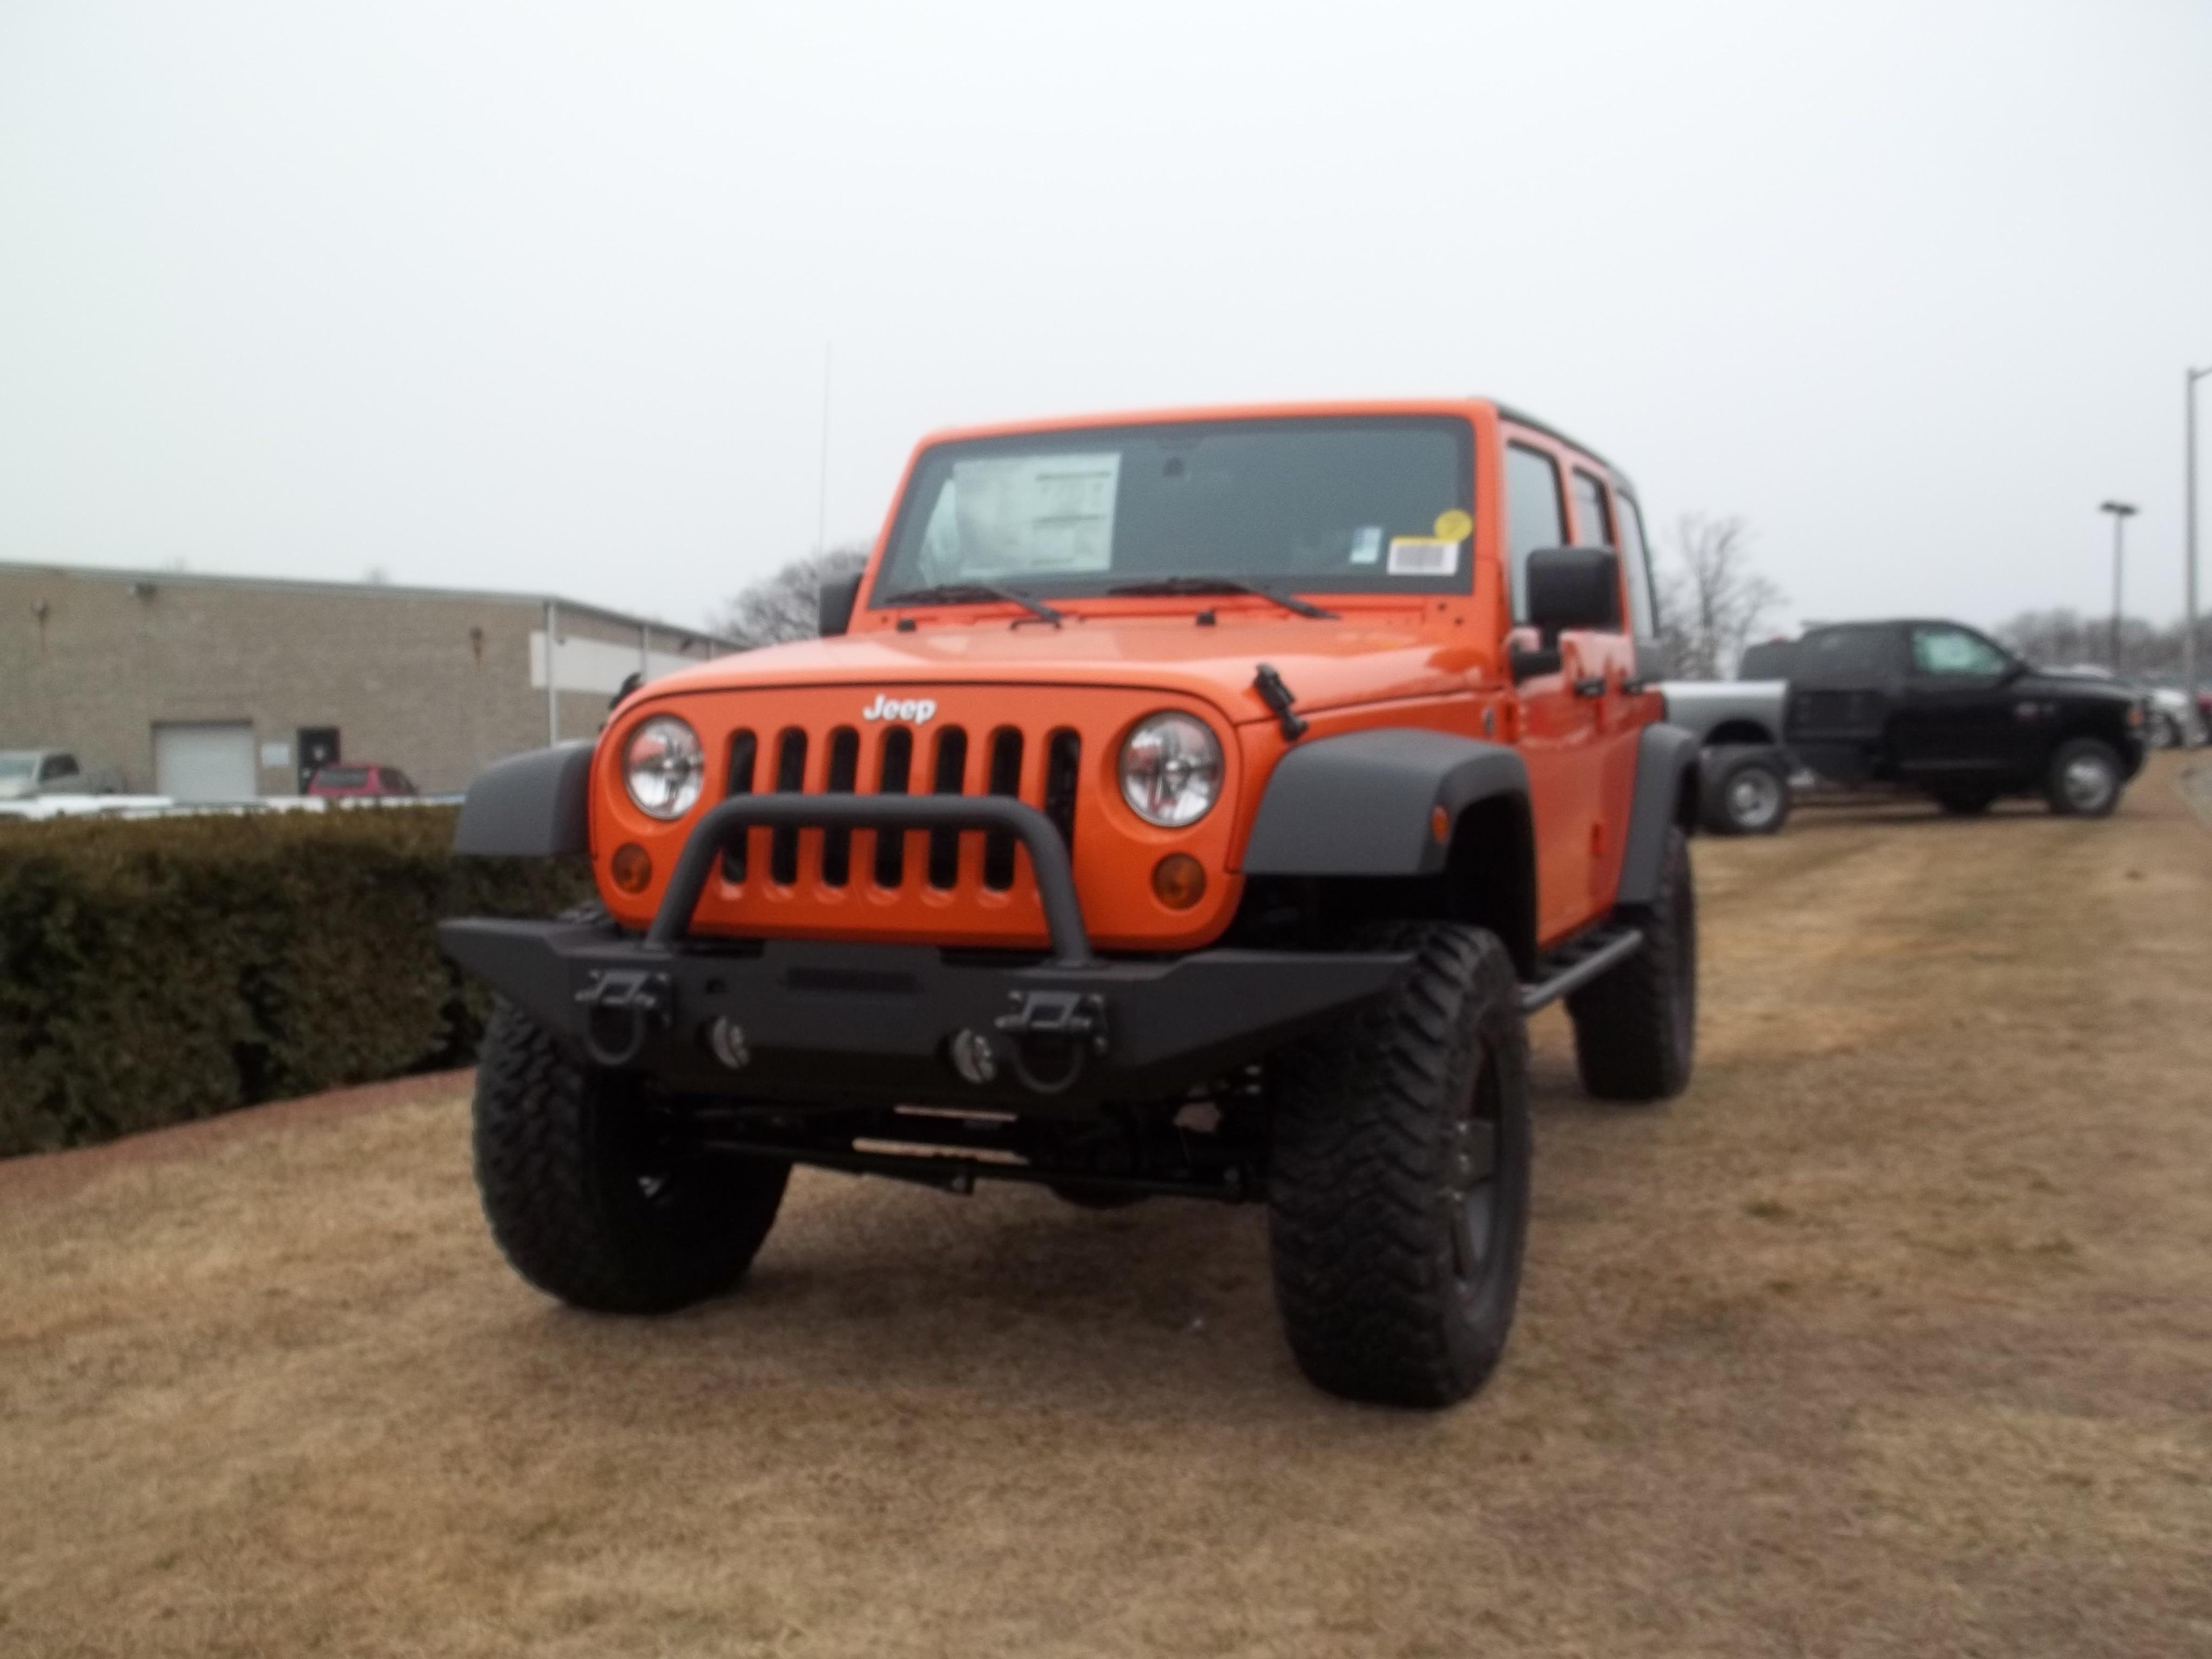 Herb Chambers Millbury >> Herb Chambers Chrysler Dodge Jeep Ram FIAT of Millbury   New Jeep, Dodge, Chrysler, Ram ...